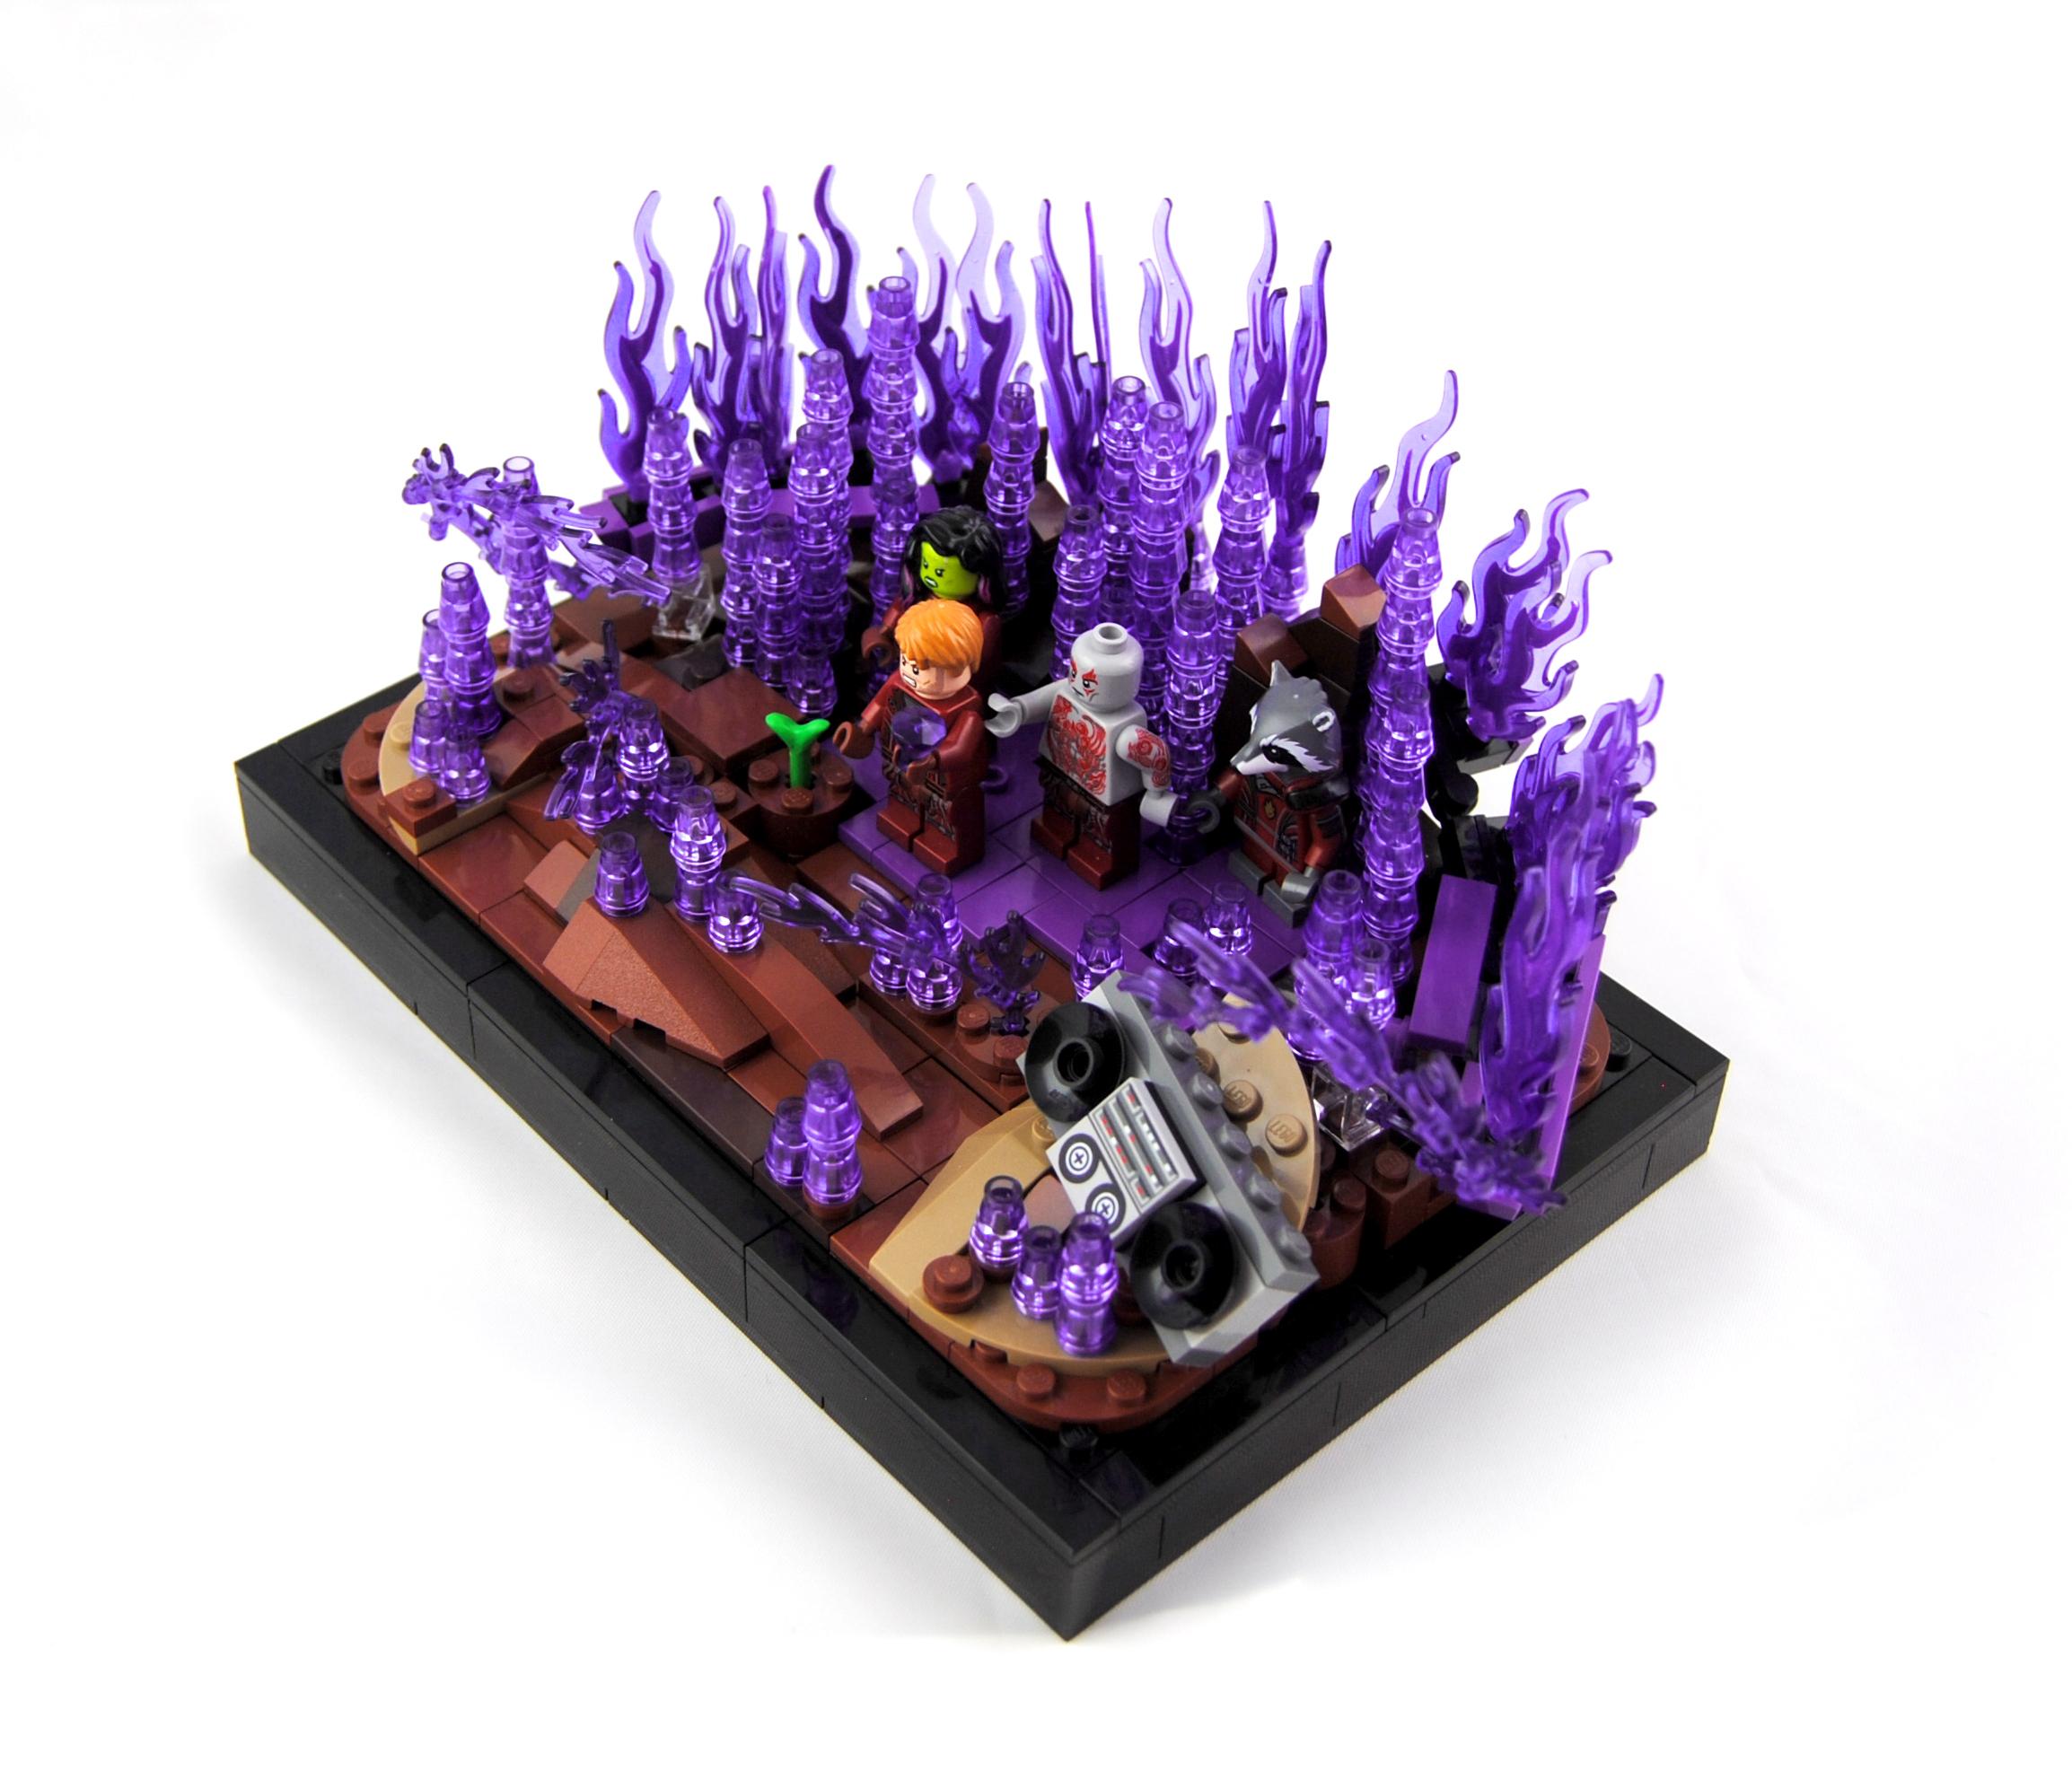 Wallpaper Galaxy Space Purple Lego Fire Gamora Groot Stone